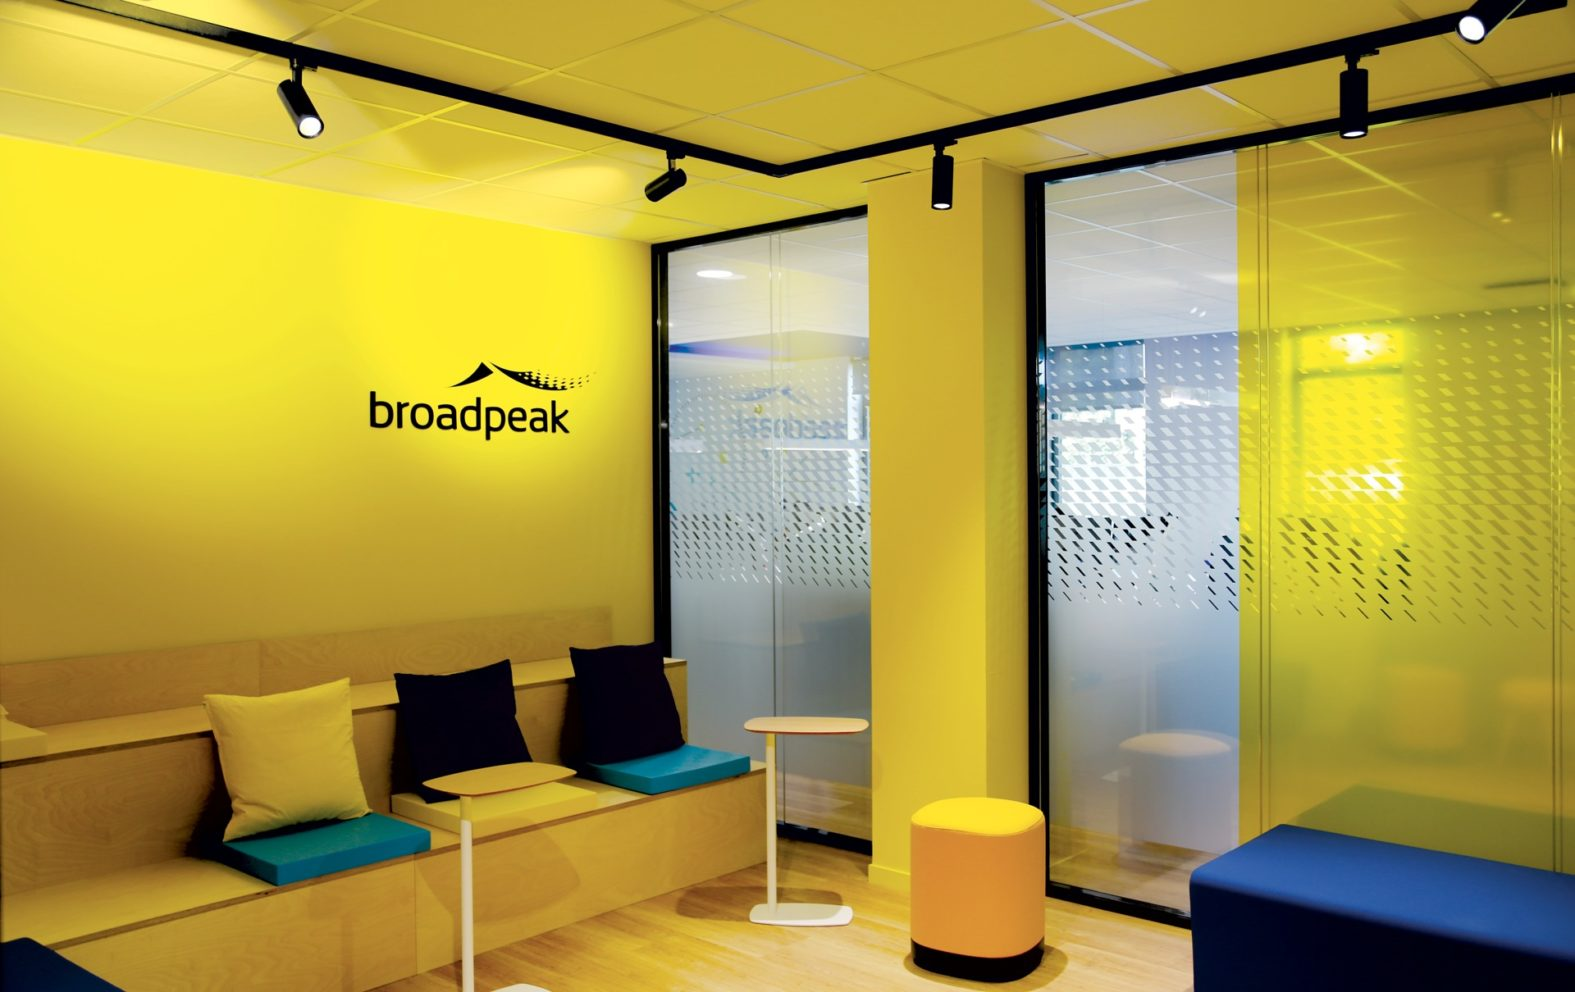 Landeau Création Broadpeak signalétique